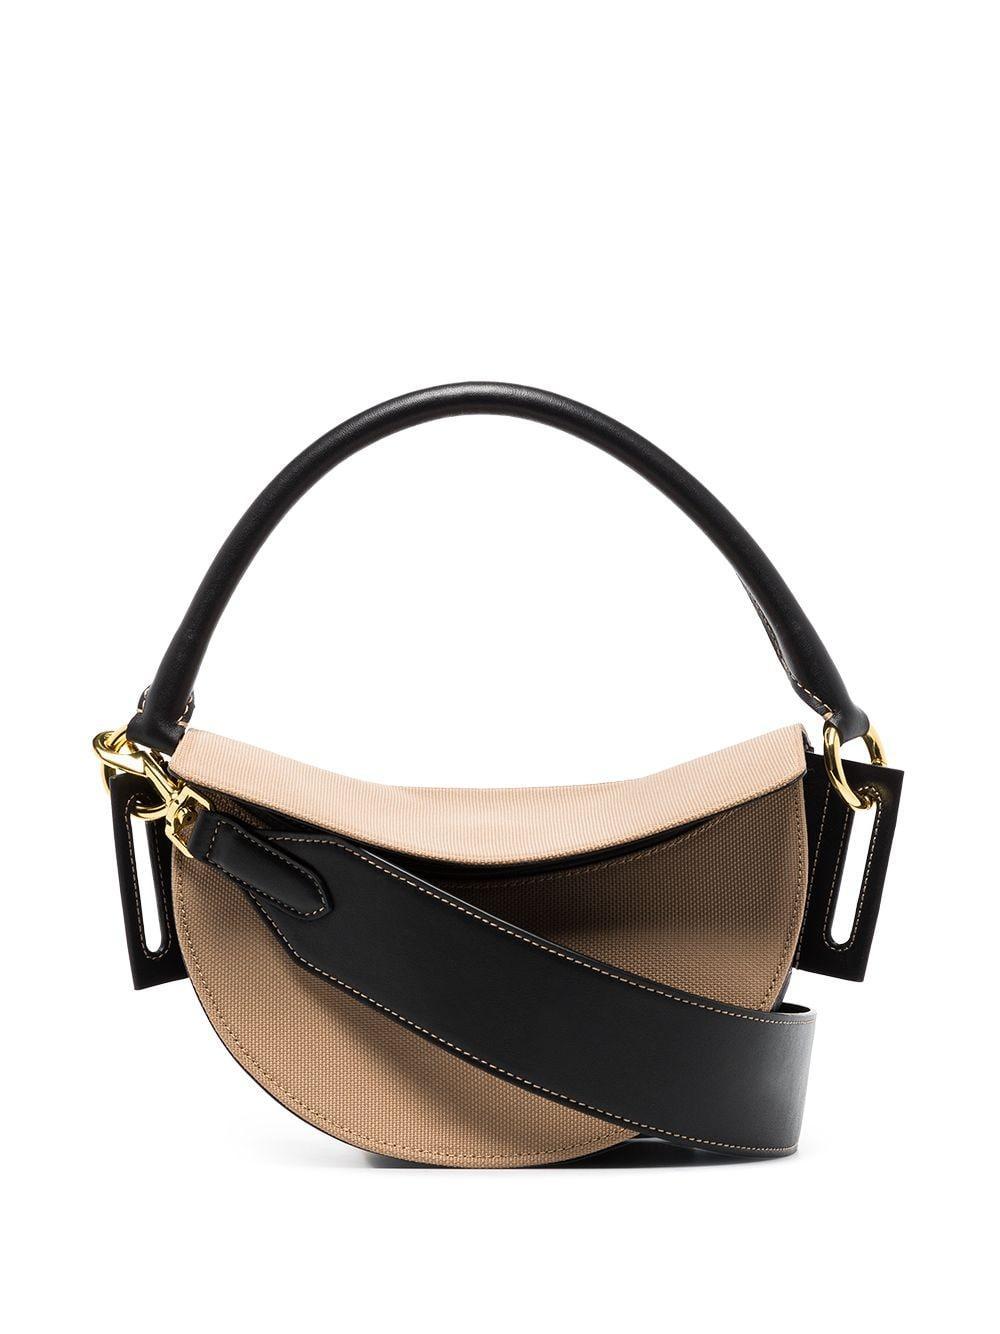 Dip Shoulder Bag Item # YUZPF20-DI-04